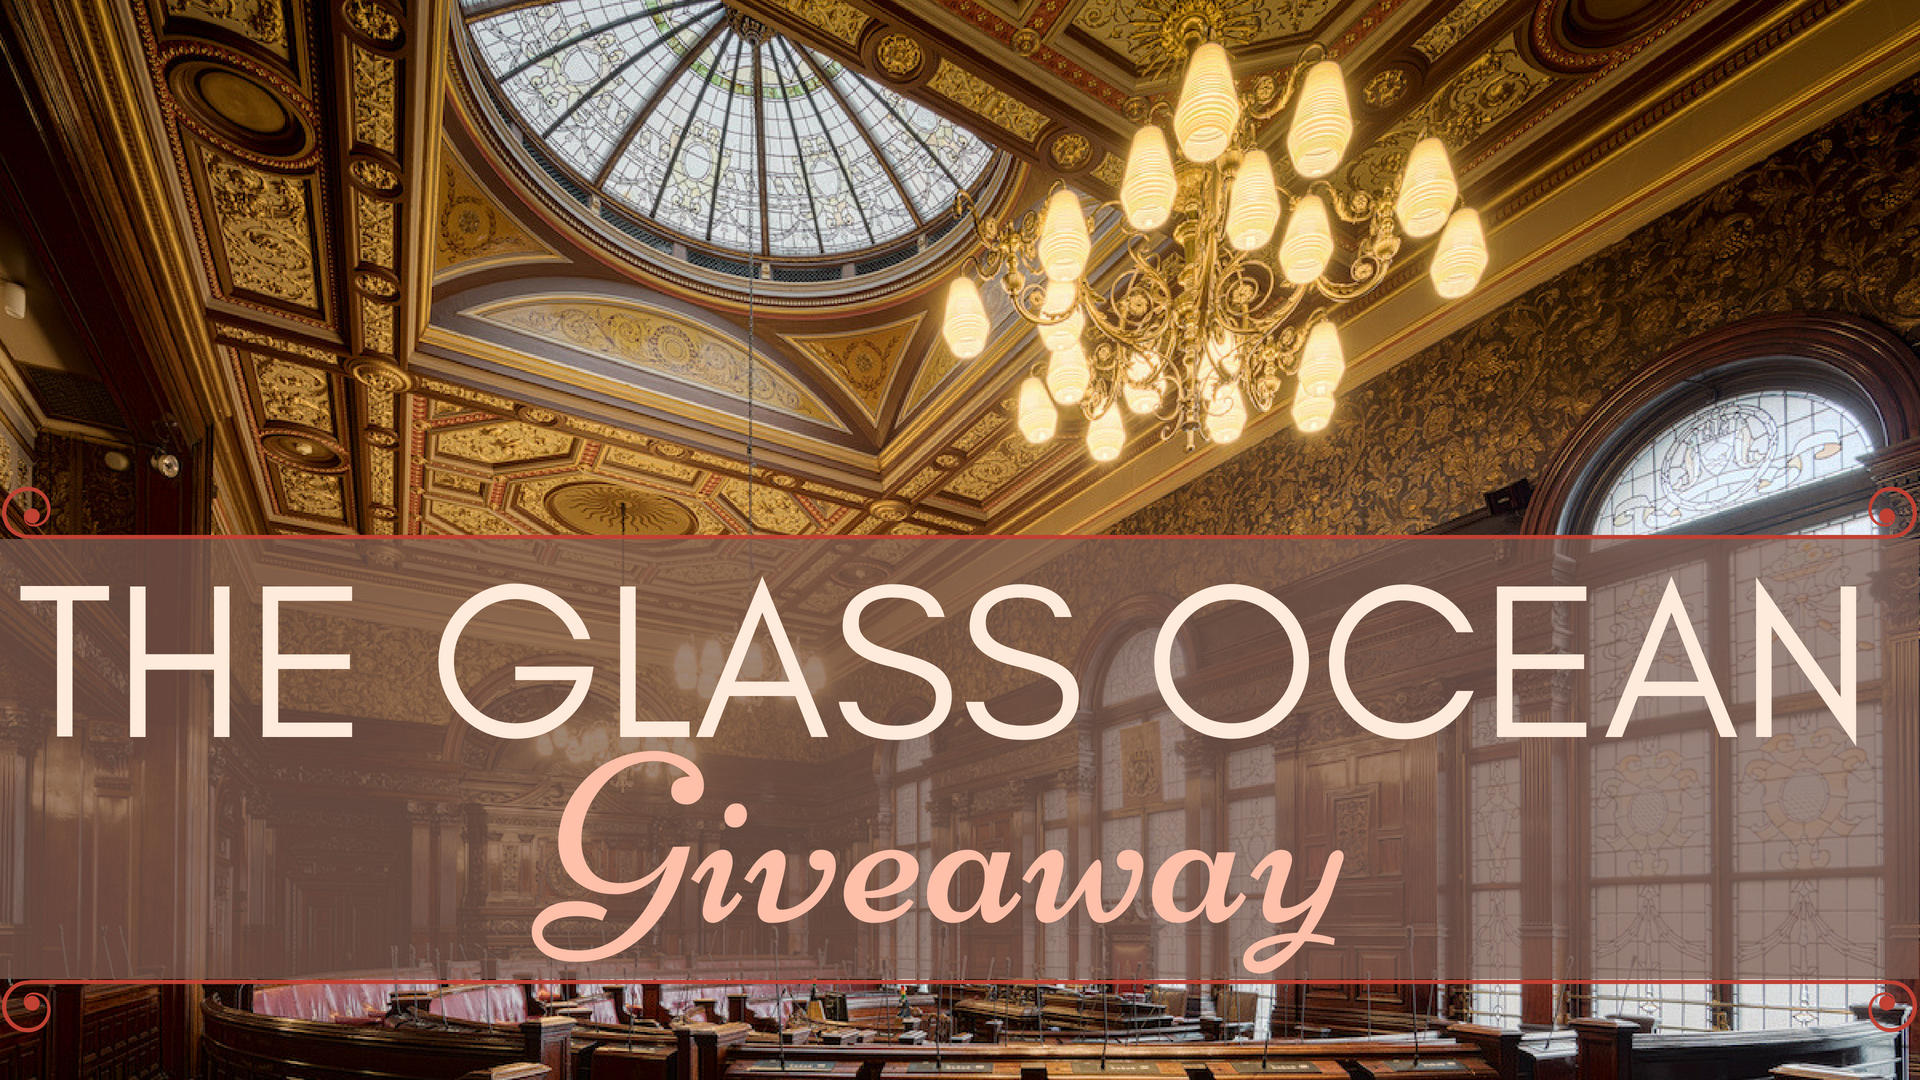 banner-the-glass-ocean-giveaway-02.jpg